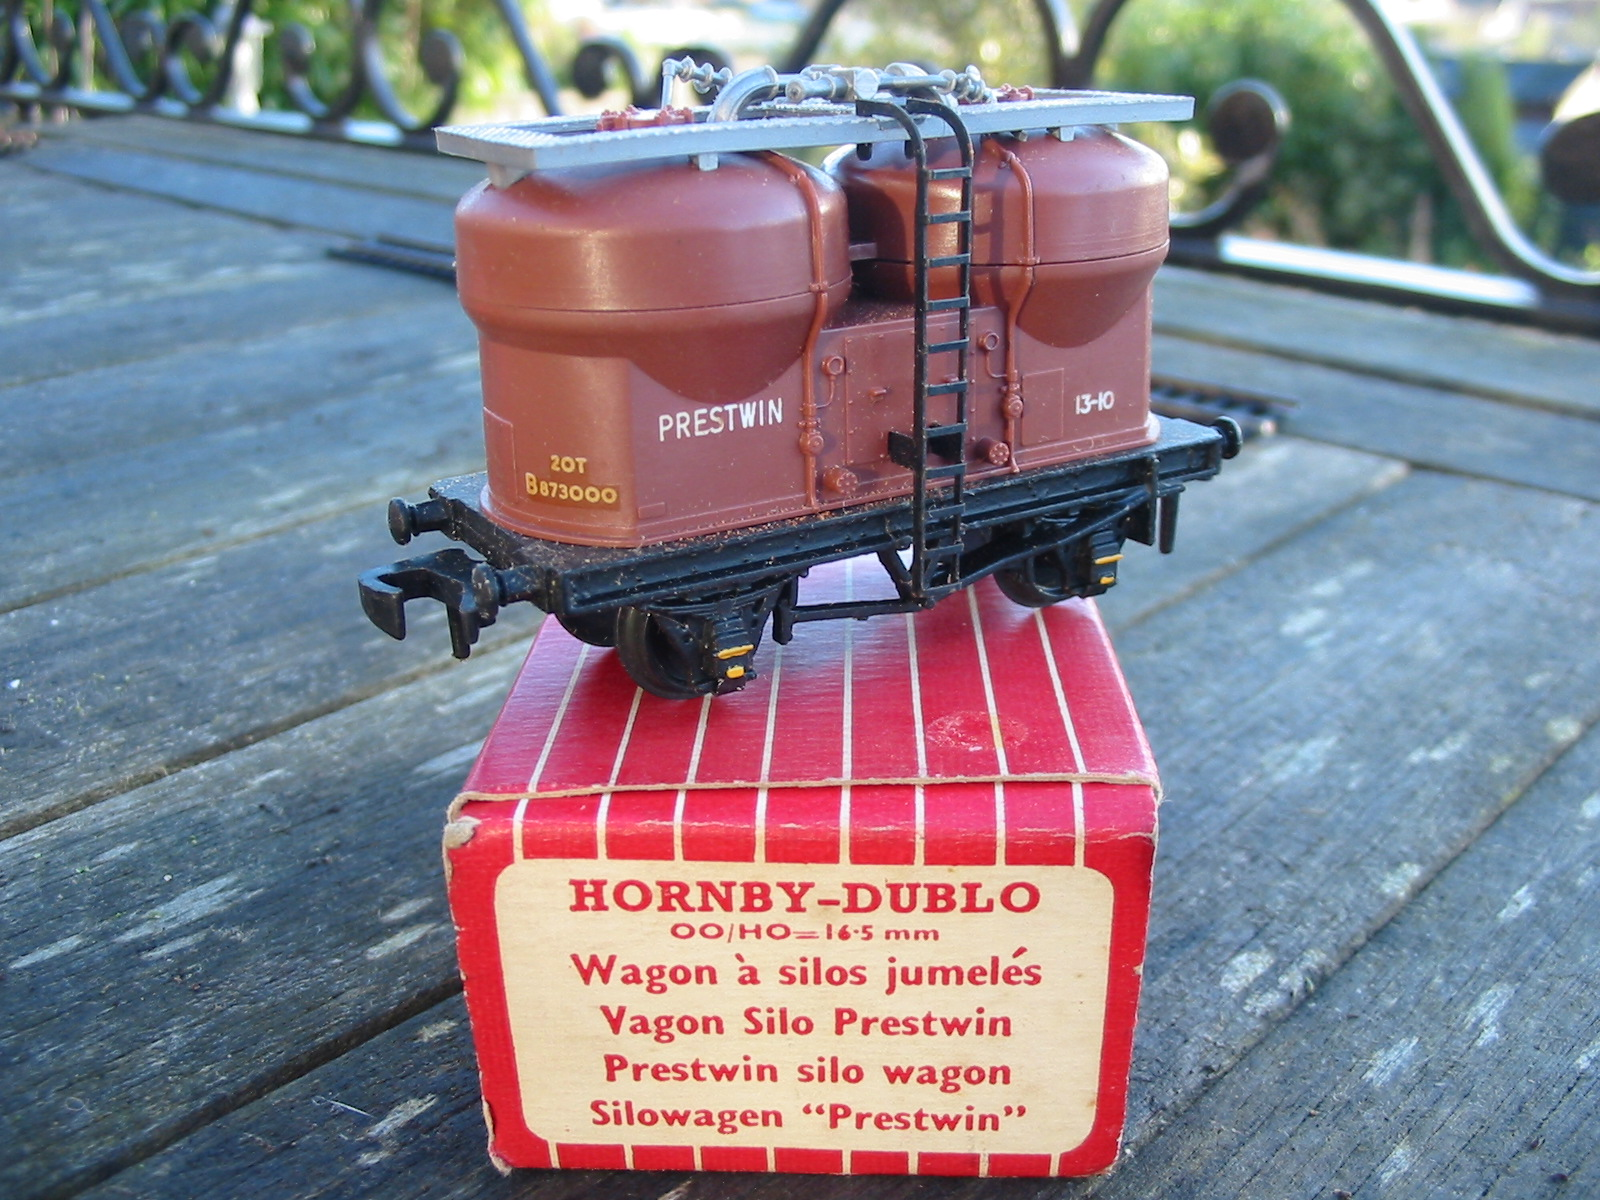 hornby dublo 4658  23 rail prestwin twin silo wagon